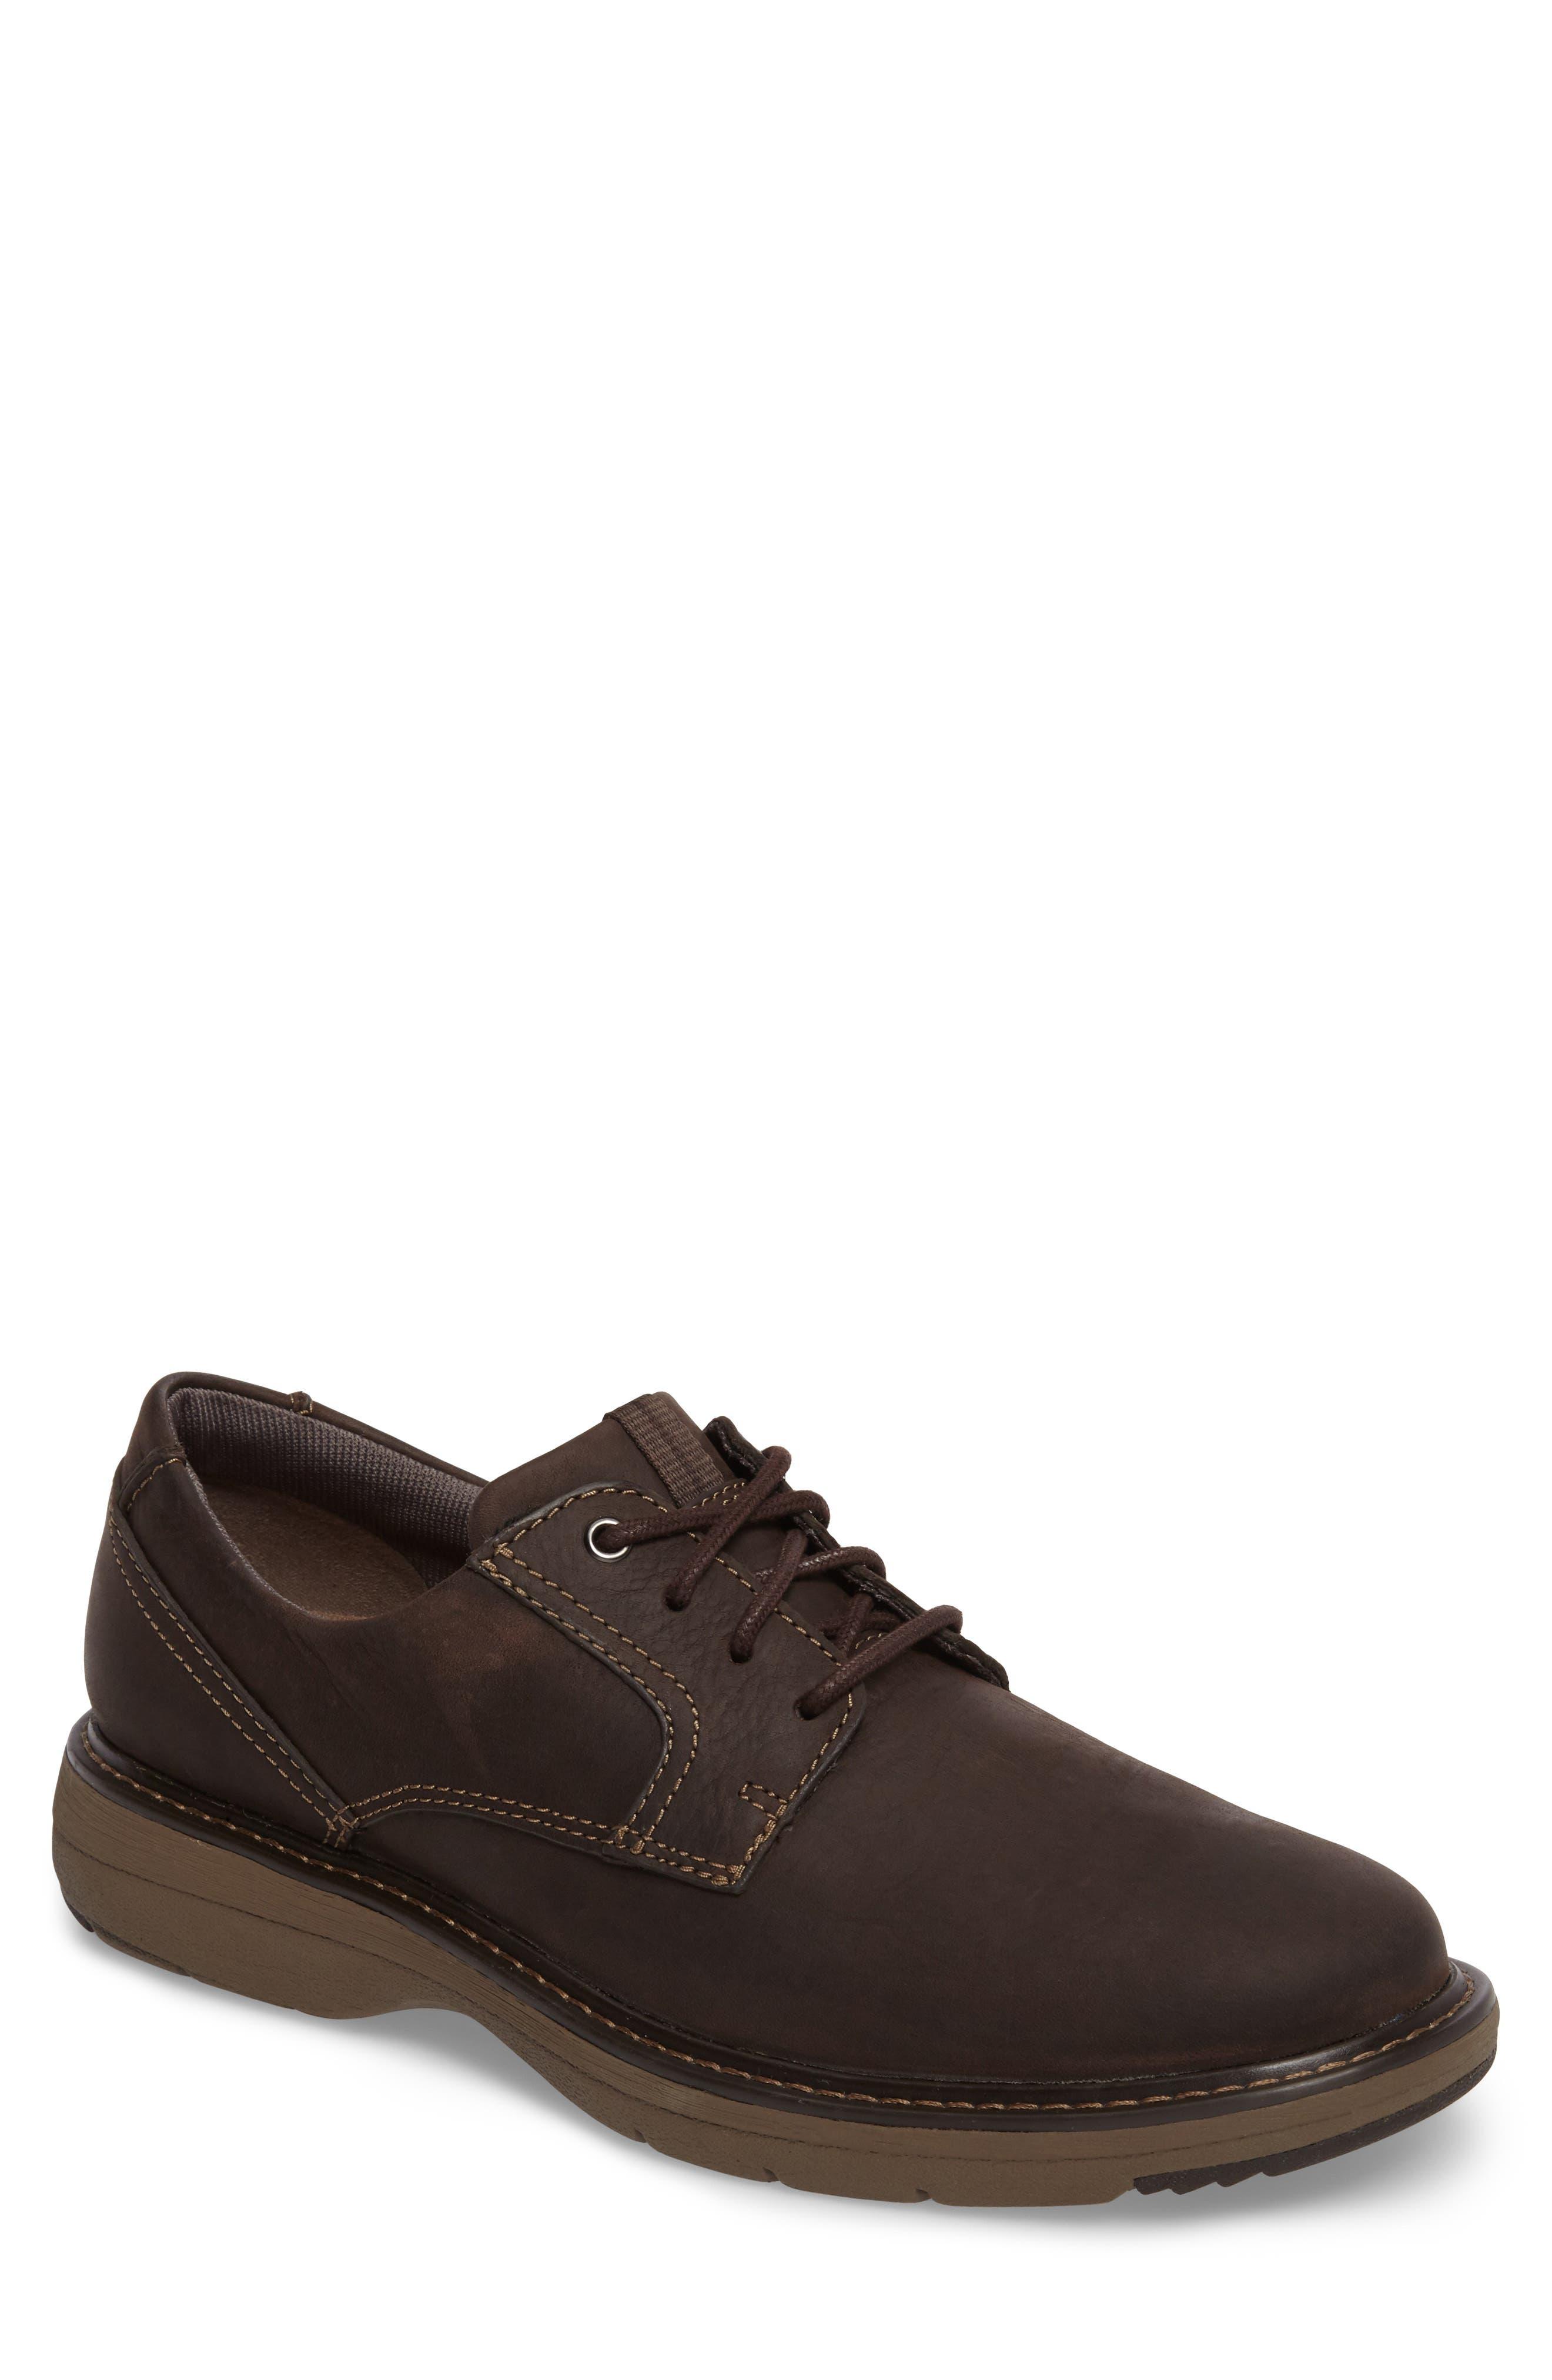 Alternate Image 1 Selected - Clarks® Cushox Plain Toe Derby (Men)